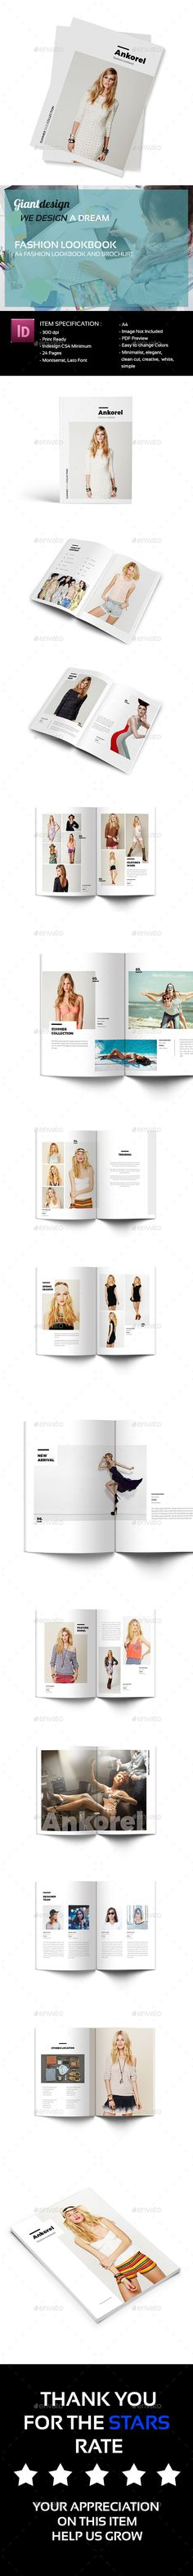 Ankorel - Fashion Lookbook